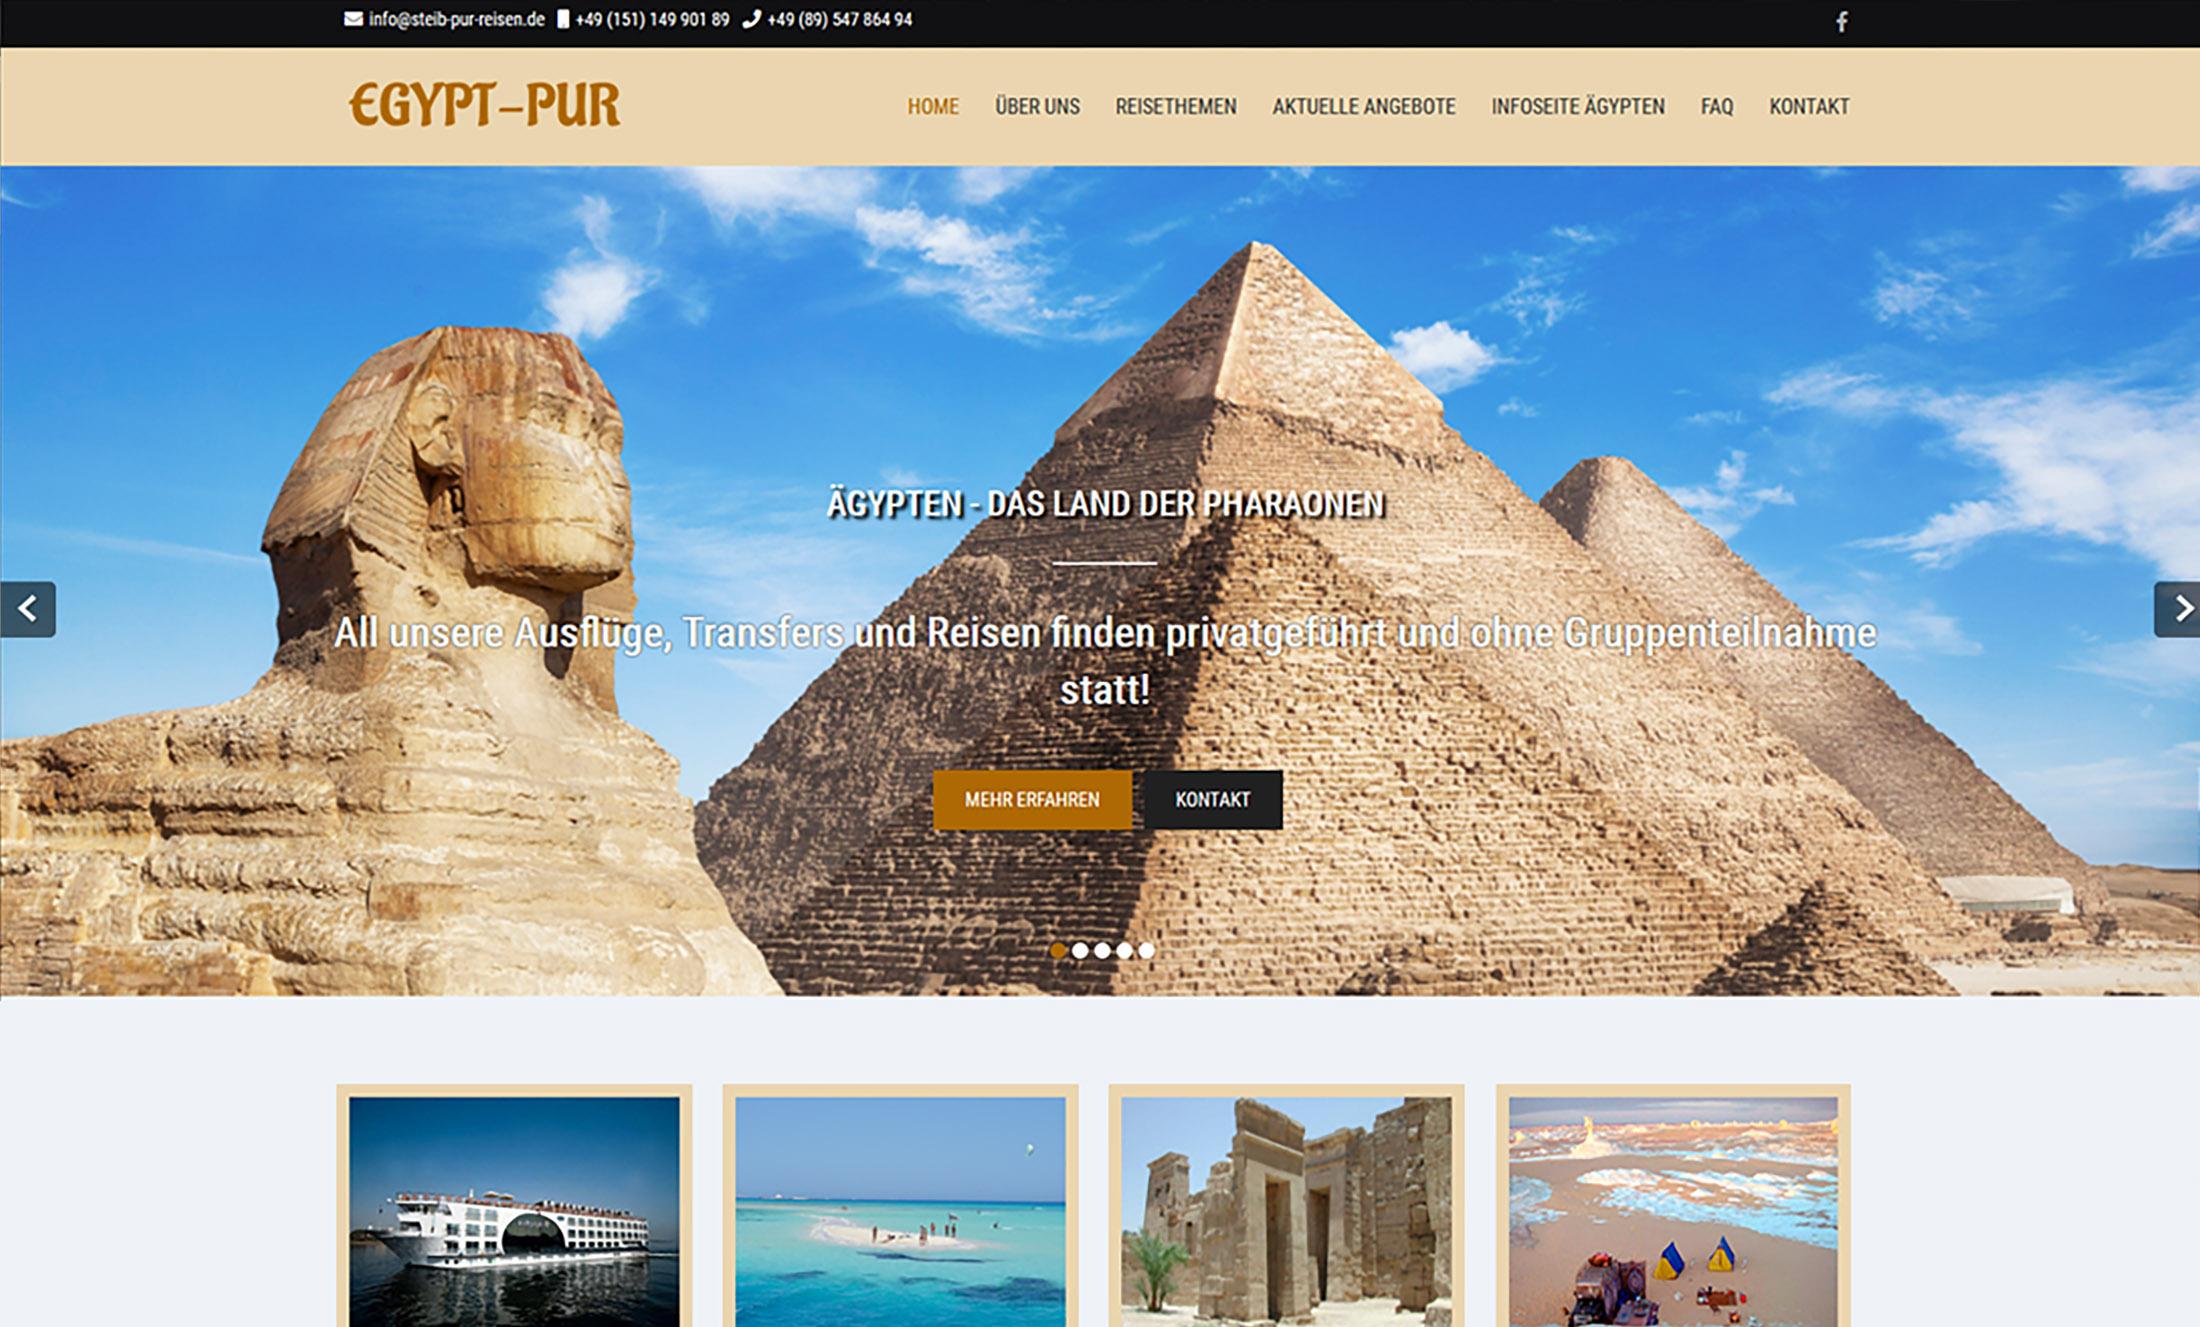 PROJEKT EYPT-PUR-REISEN